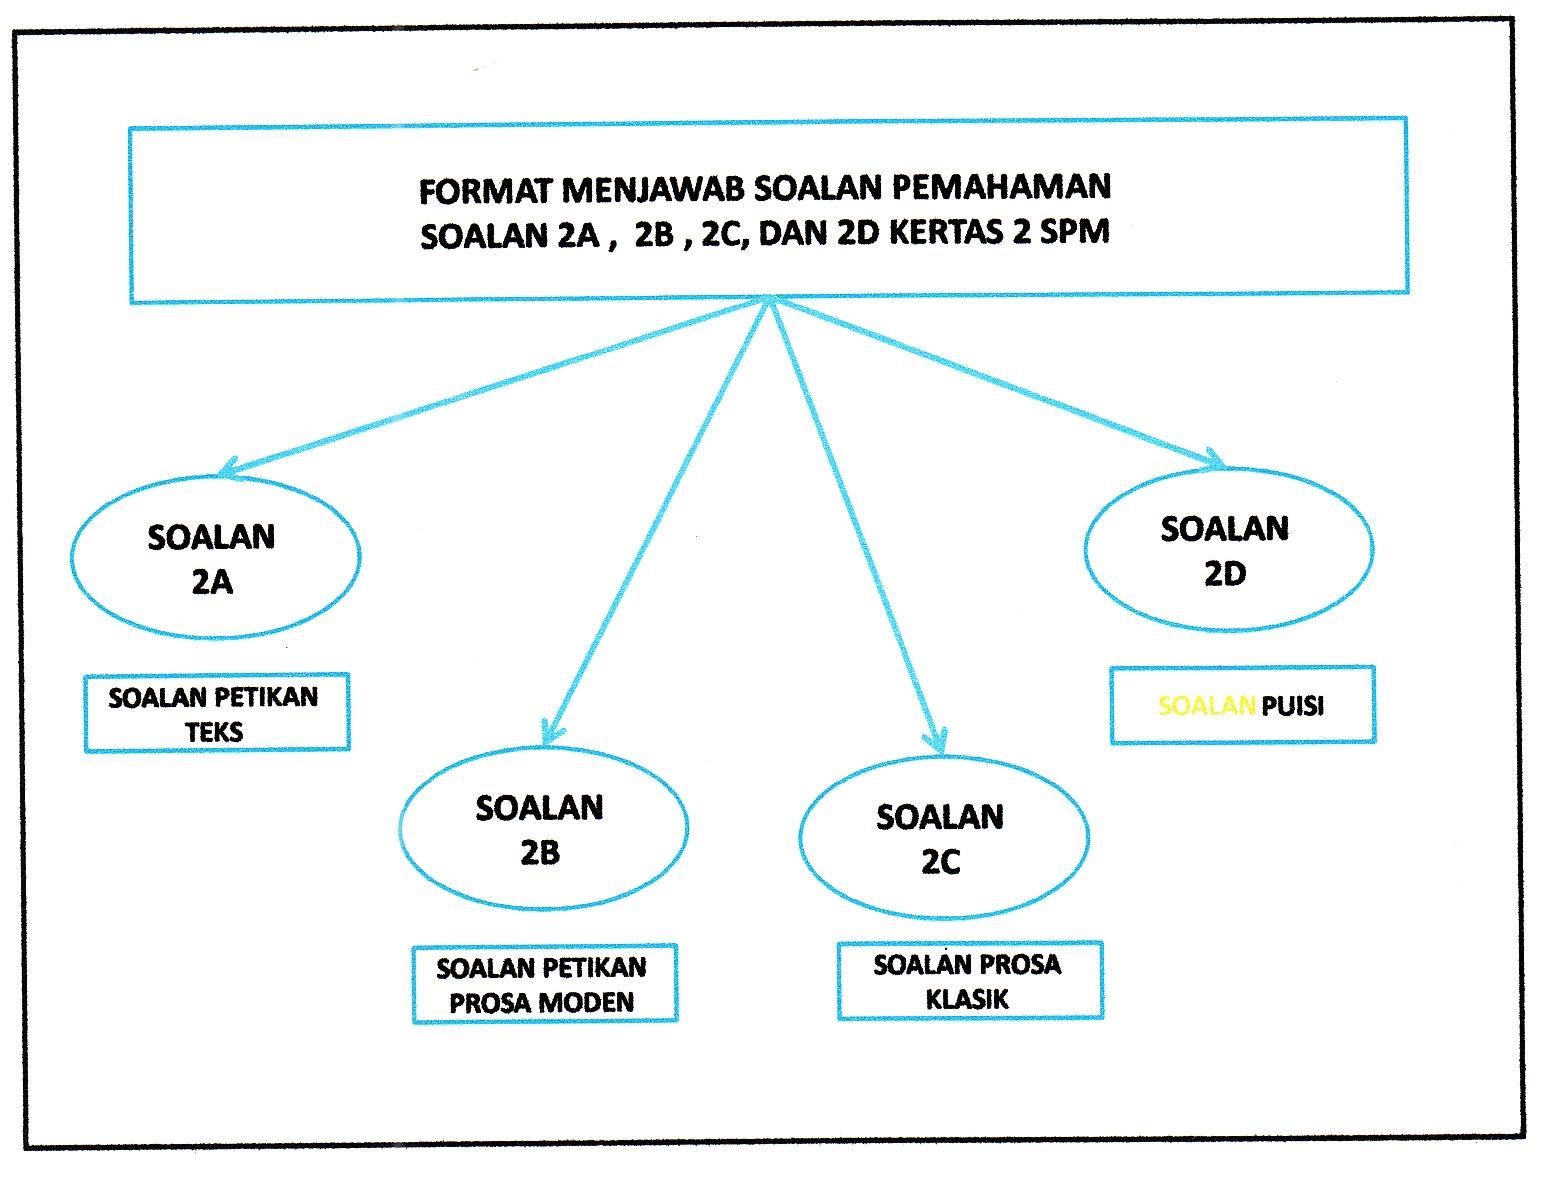 Nota Bahasa Melayu Tingkatan 1 Yang Sangat Meletup Laman Bahasa Melayu Spm Pemahaman Komsas Antologi Tingkatan 4 Dan 5 Of Himpunan Nota Bahasa Melayu Tingkatan 1 Yang Berguna Untuk Para Murid Cetakkan